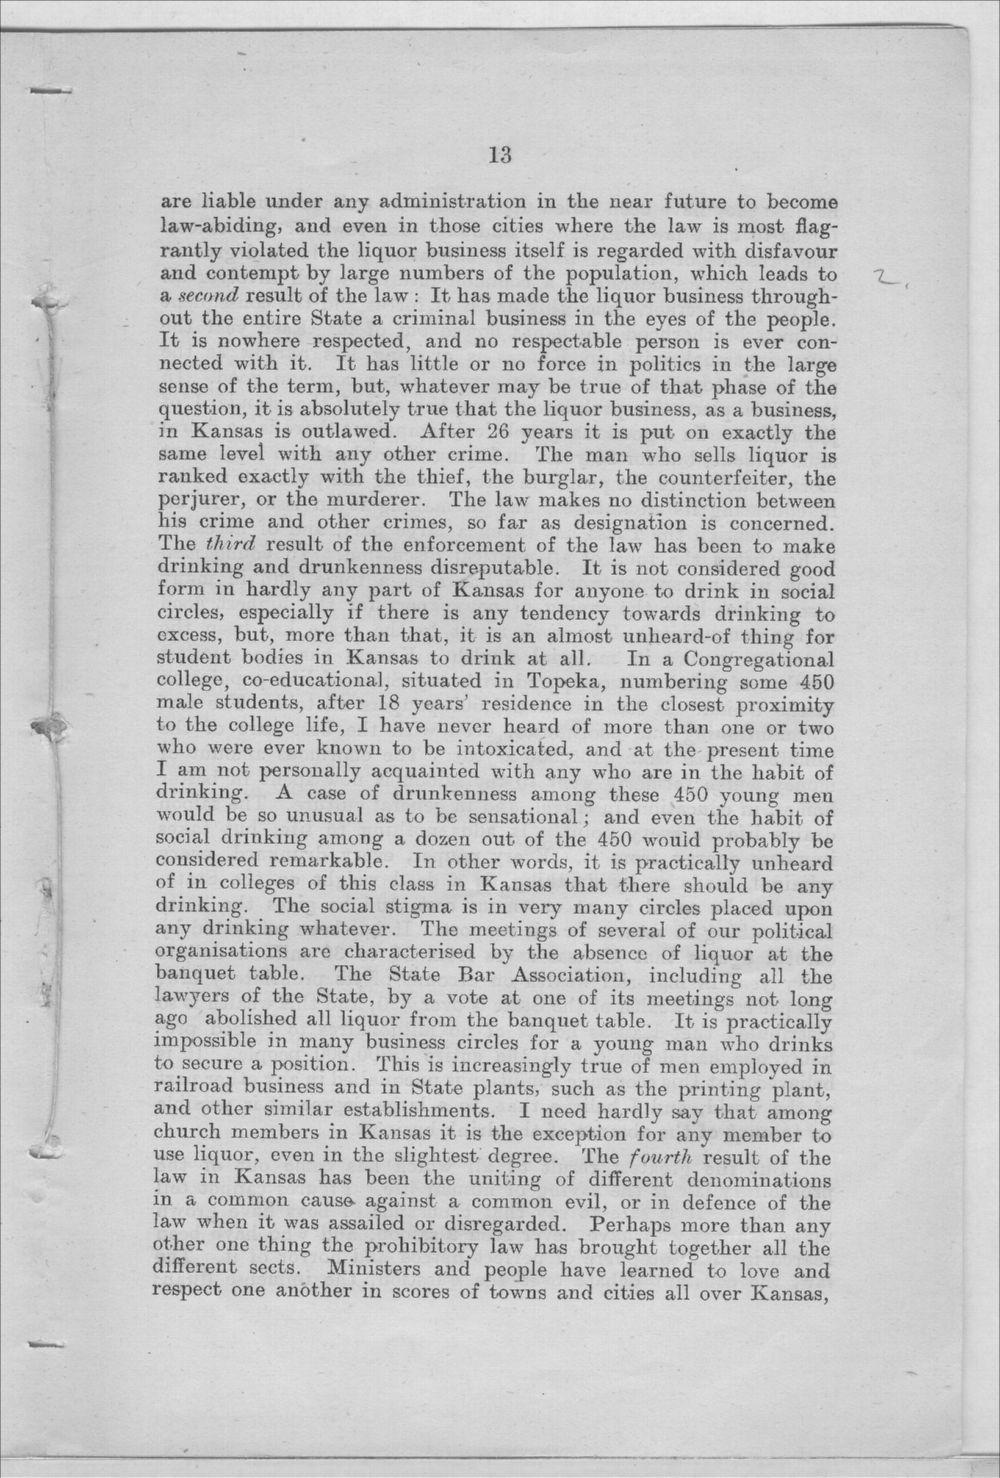 Prohibition in Kansas, U.S.A. - 13